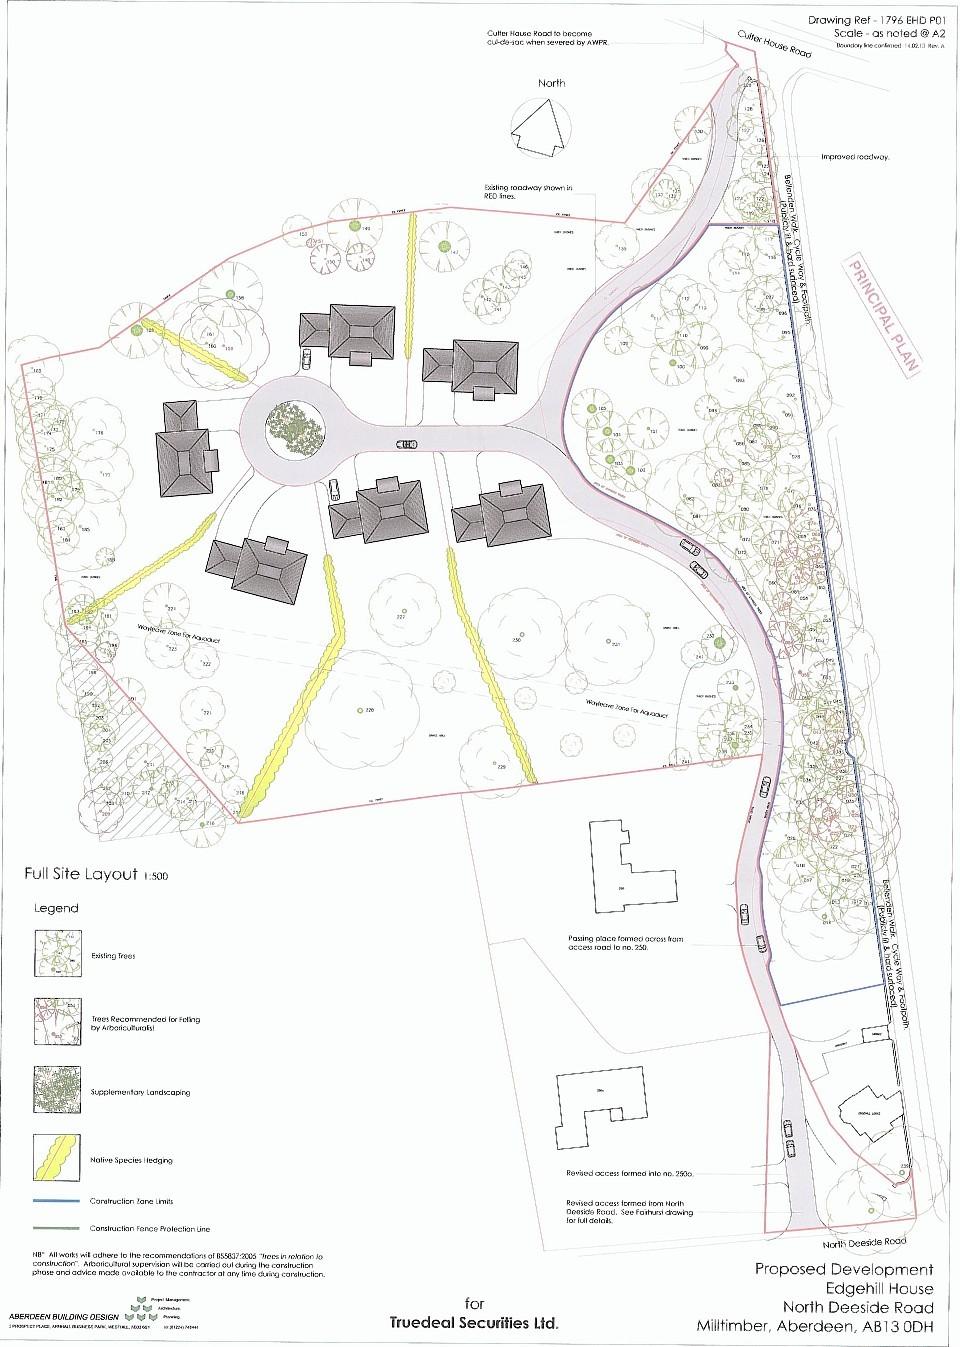 Plans for land on Edgehill House